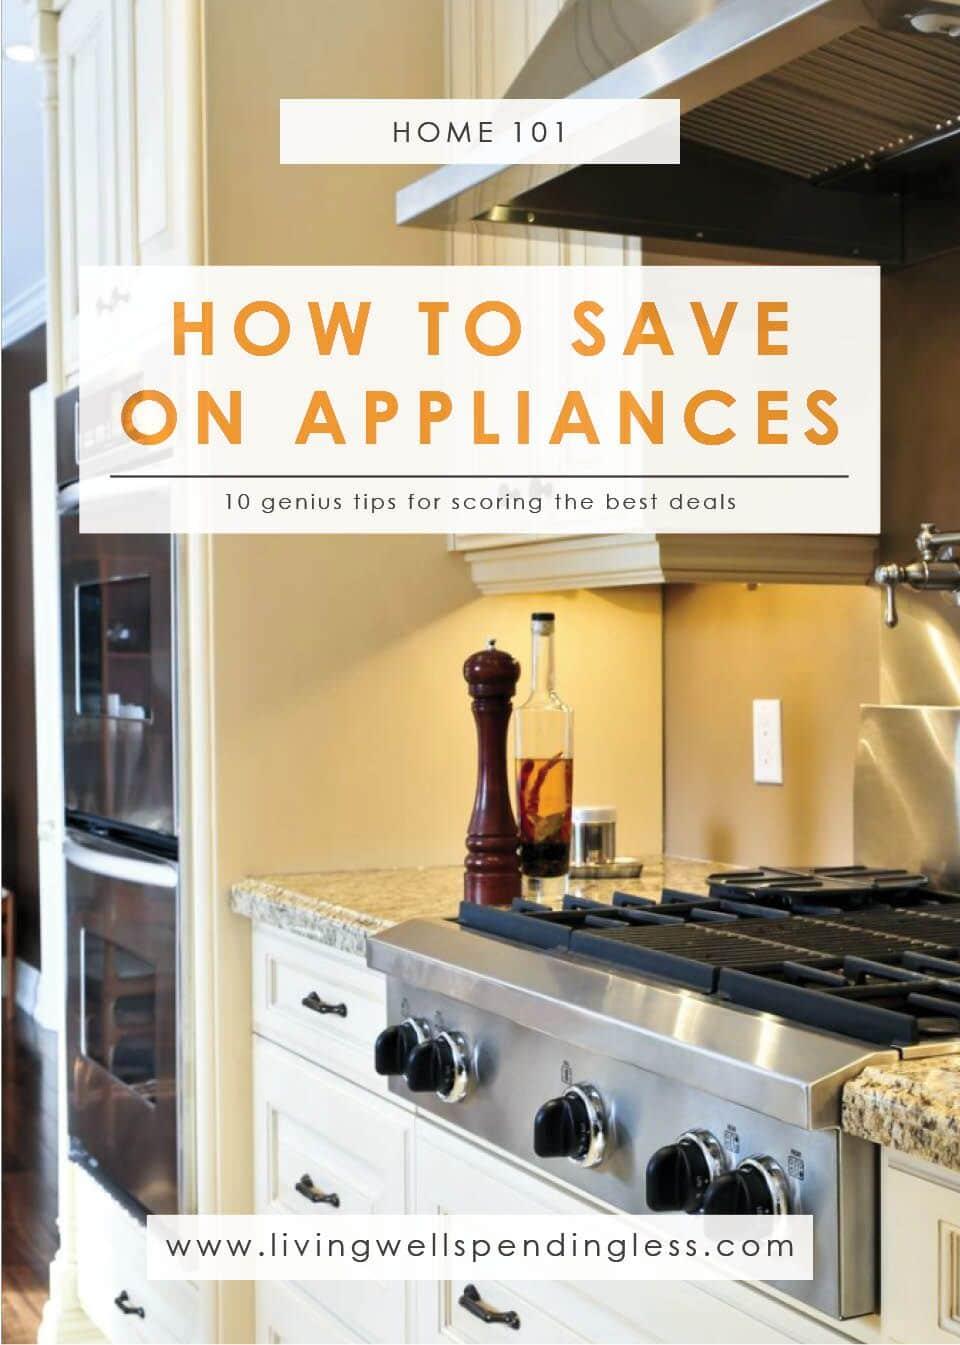 Save on Appliances   Money   Budgeting   Home 101   Money Saving Tips